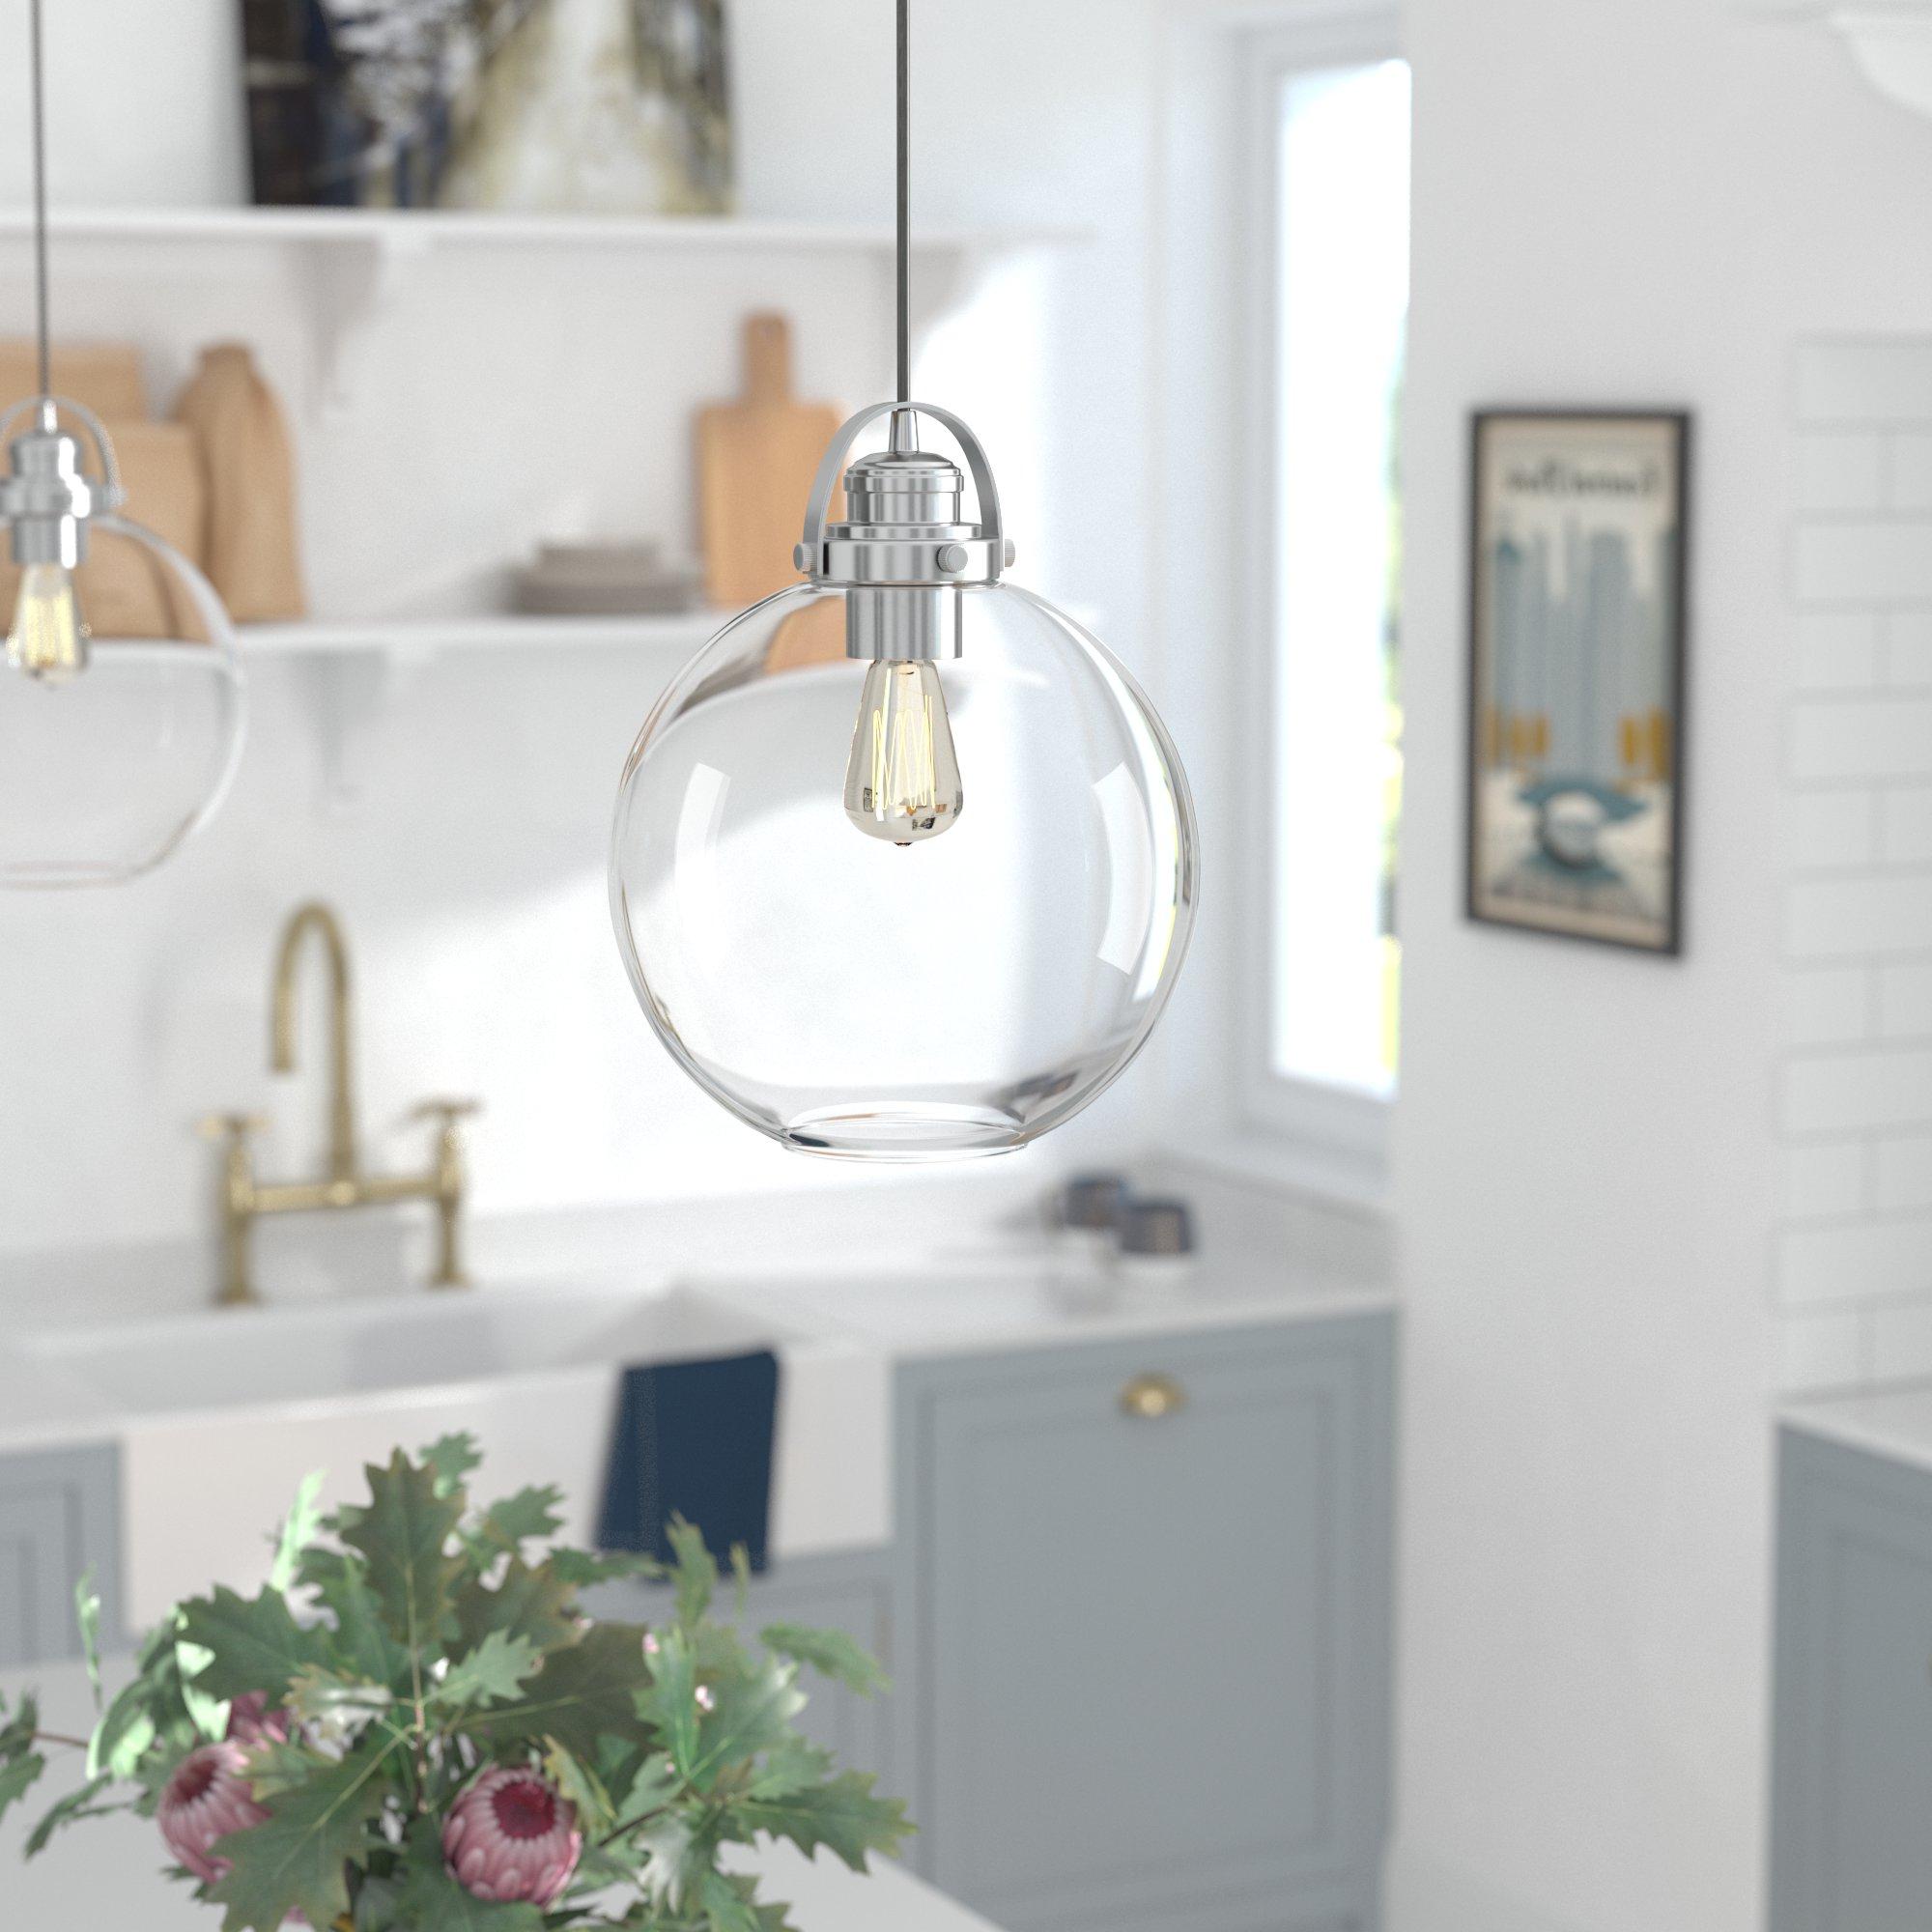 Bundy 1-Light Single Globe Pendants with regard to Most Popular Betsy 1-Light Single Globe Pendant